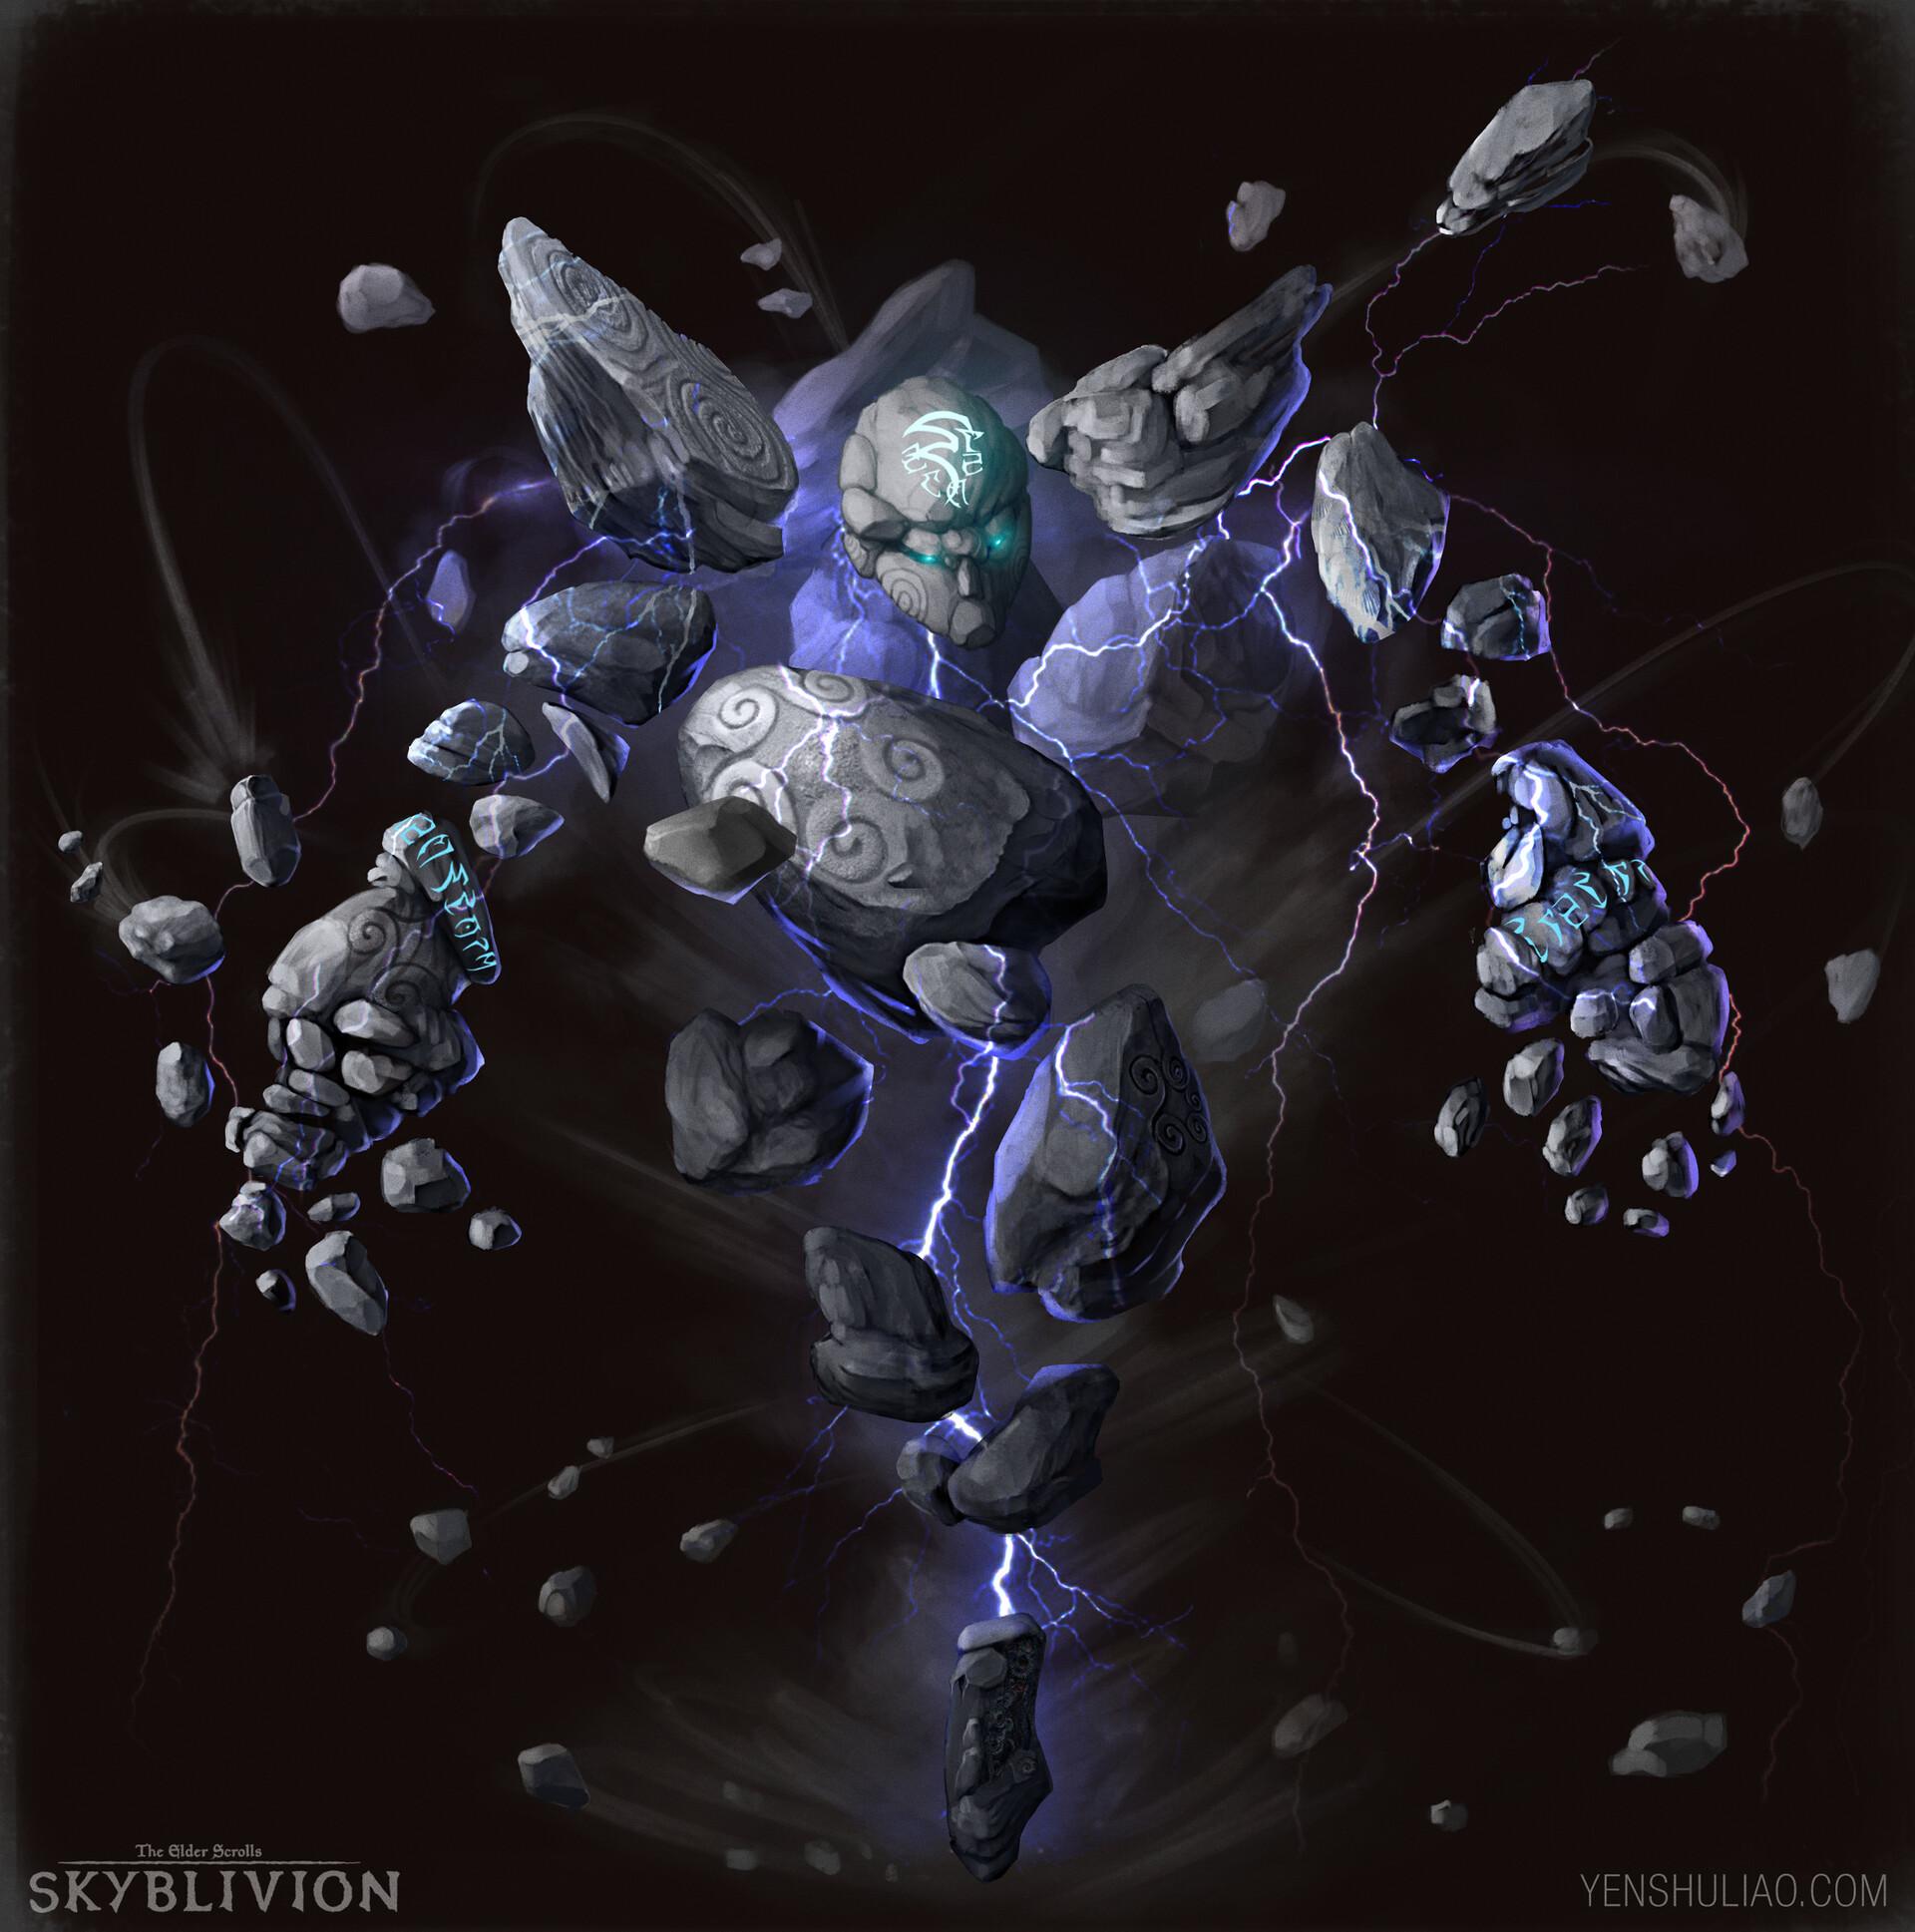 Yen shu liao creature concept elder scrolls skyblivion storm atronach skyrim yenshuliao